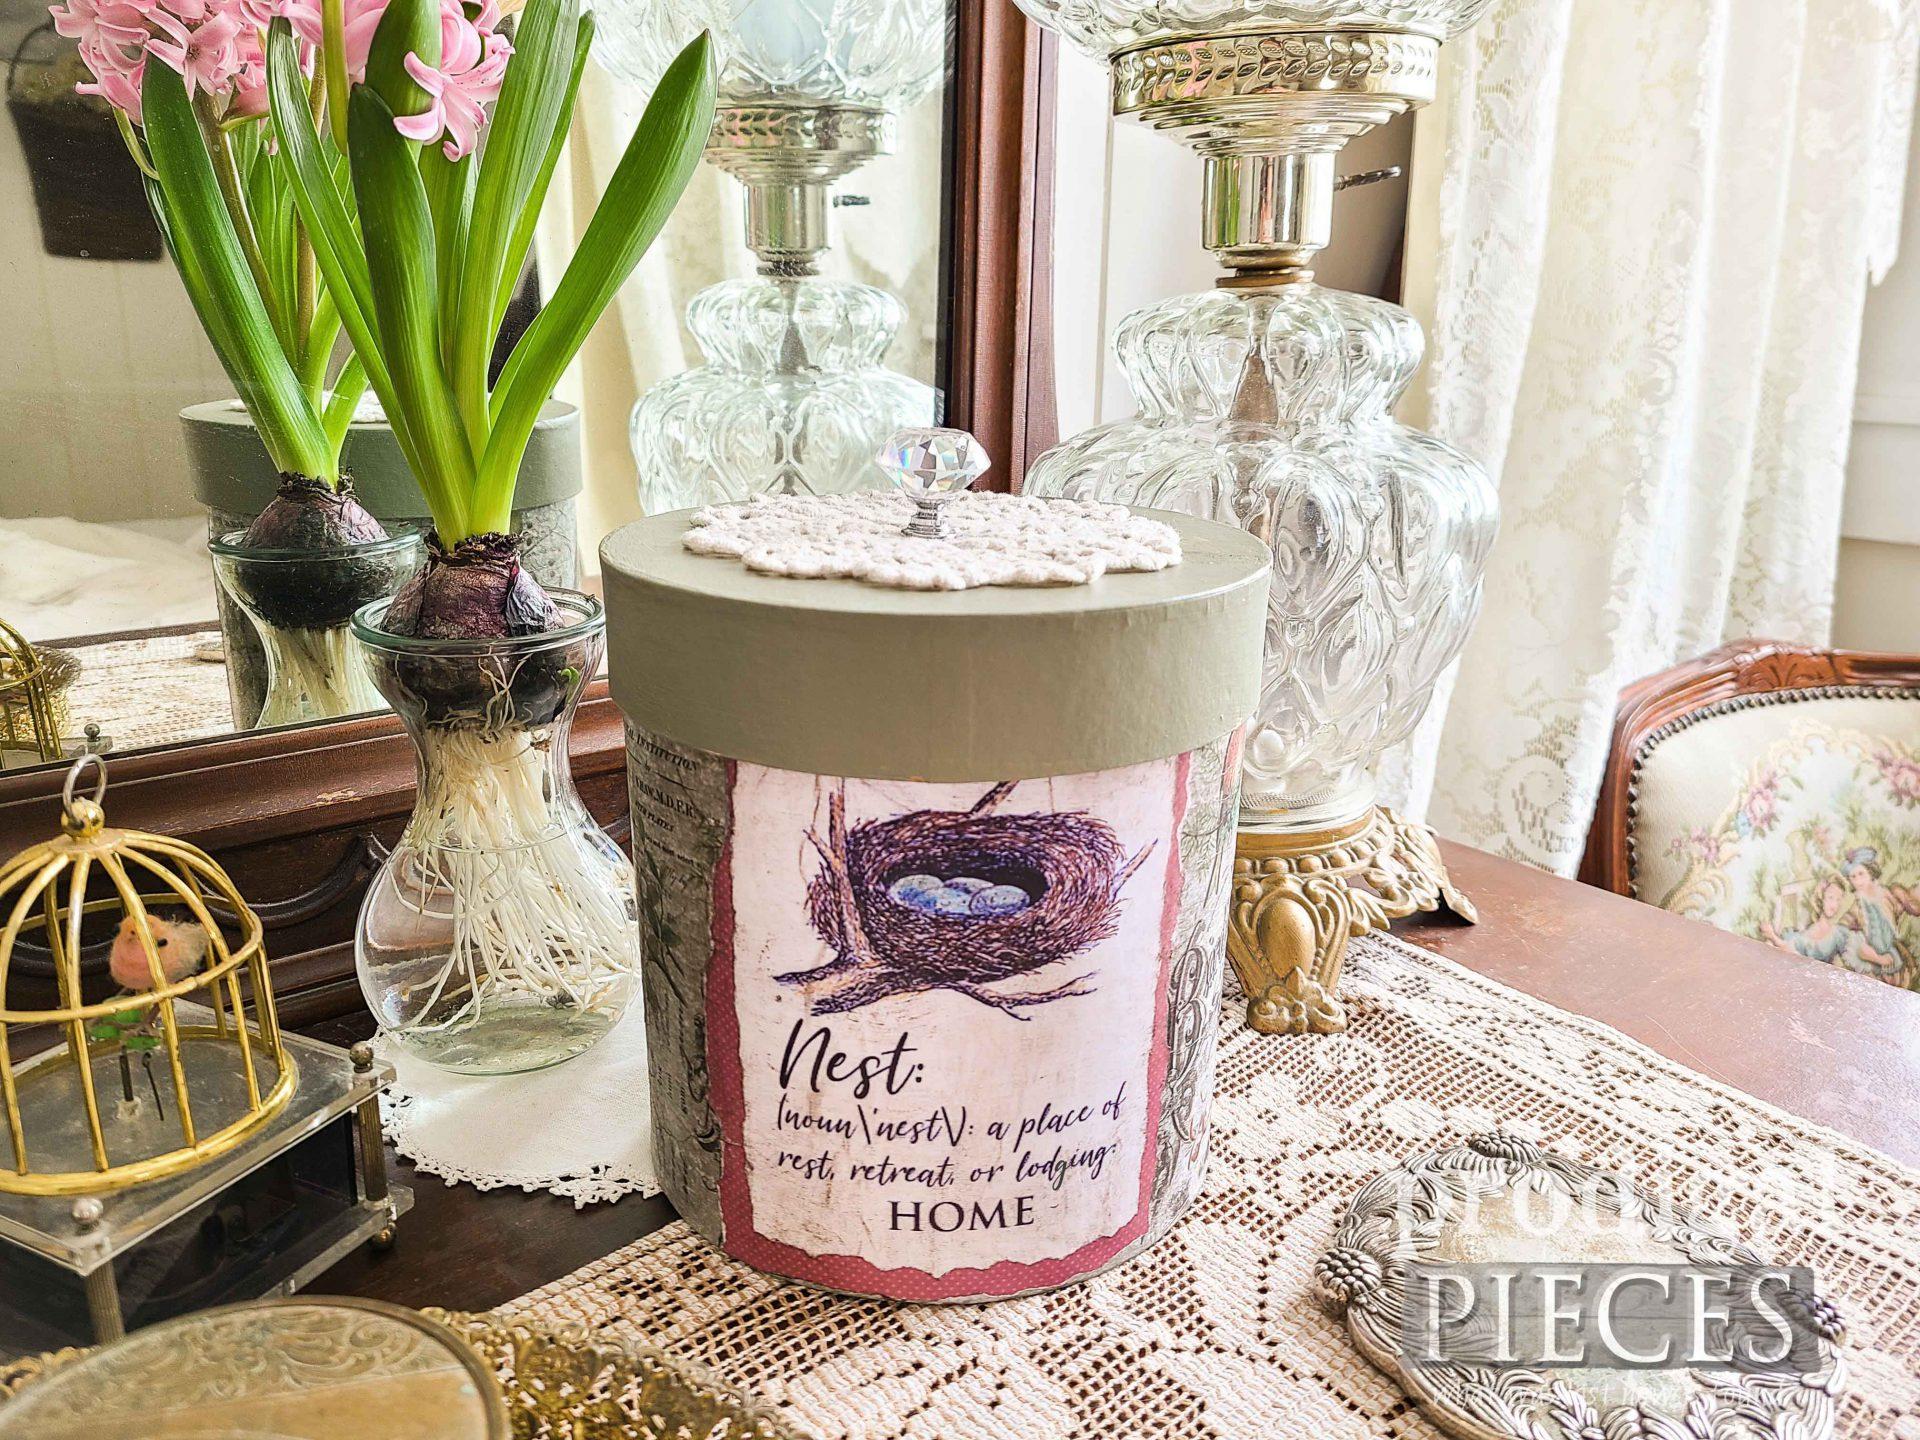 Vintage Style DIY Decoupage Box with Birds by Larissa of Prodigal Pieces | prodigalpieces.com #prodigalpieces #diy #vintage #home #decoupage #crafts